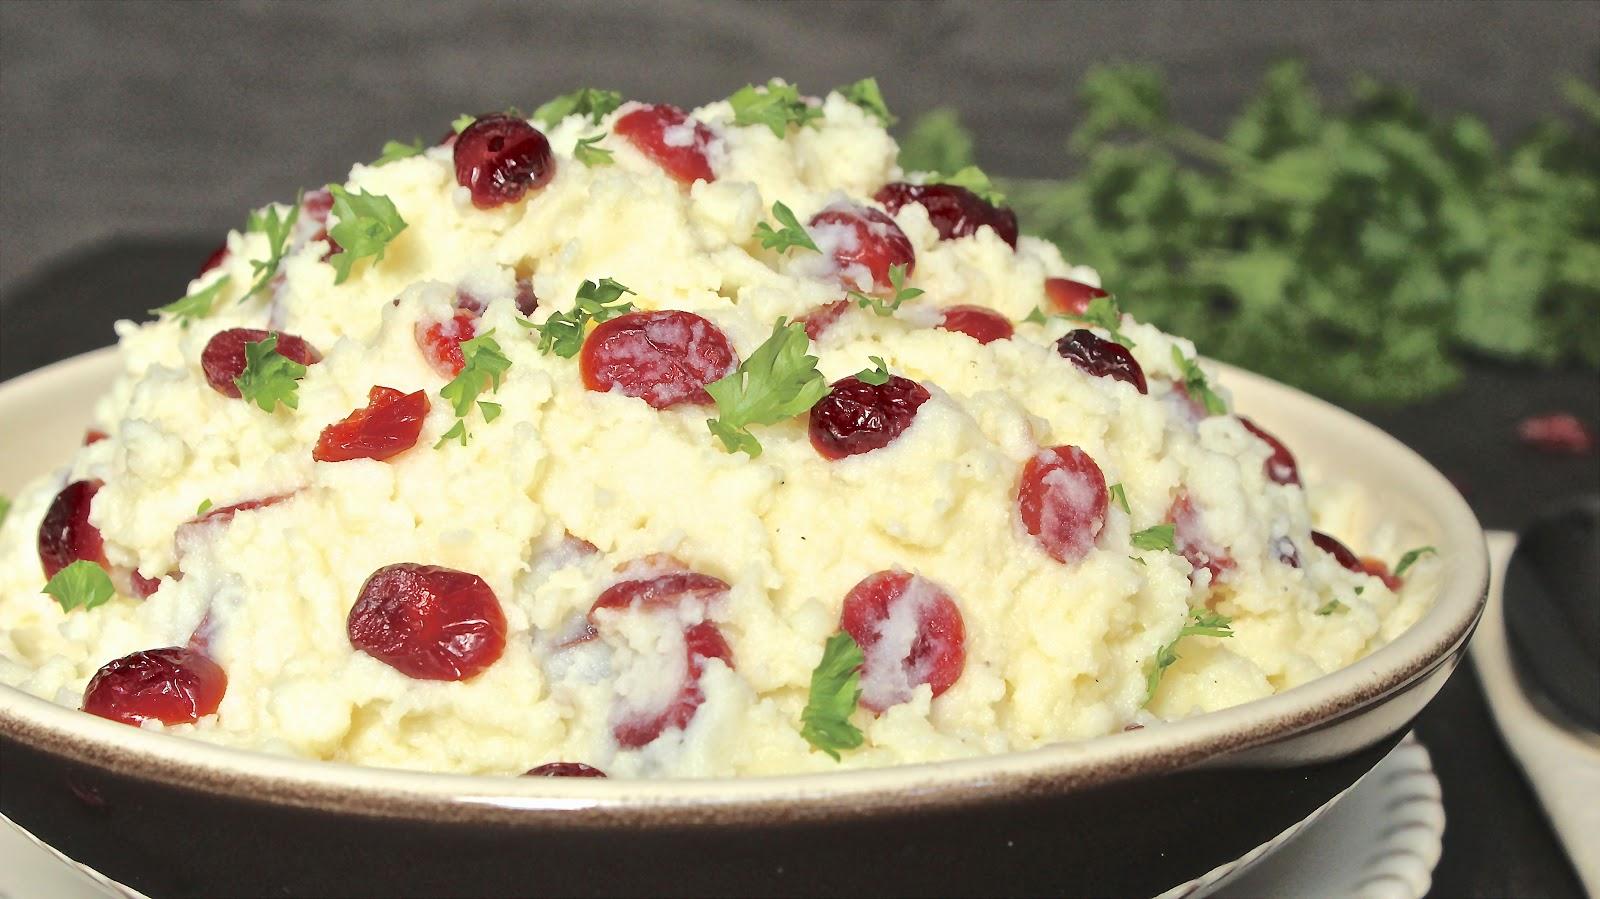 how to make mashed potato taste good